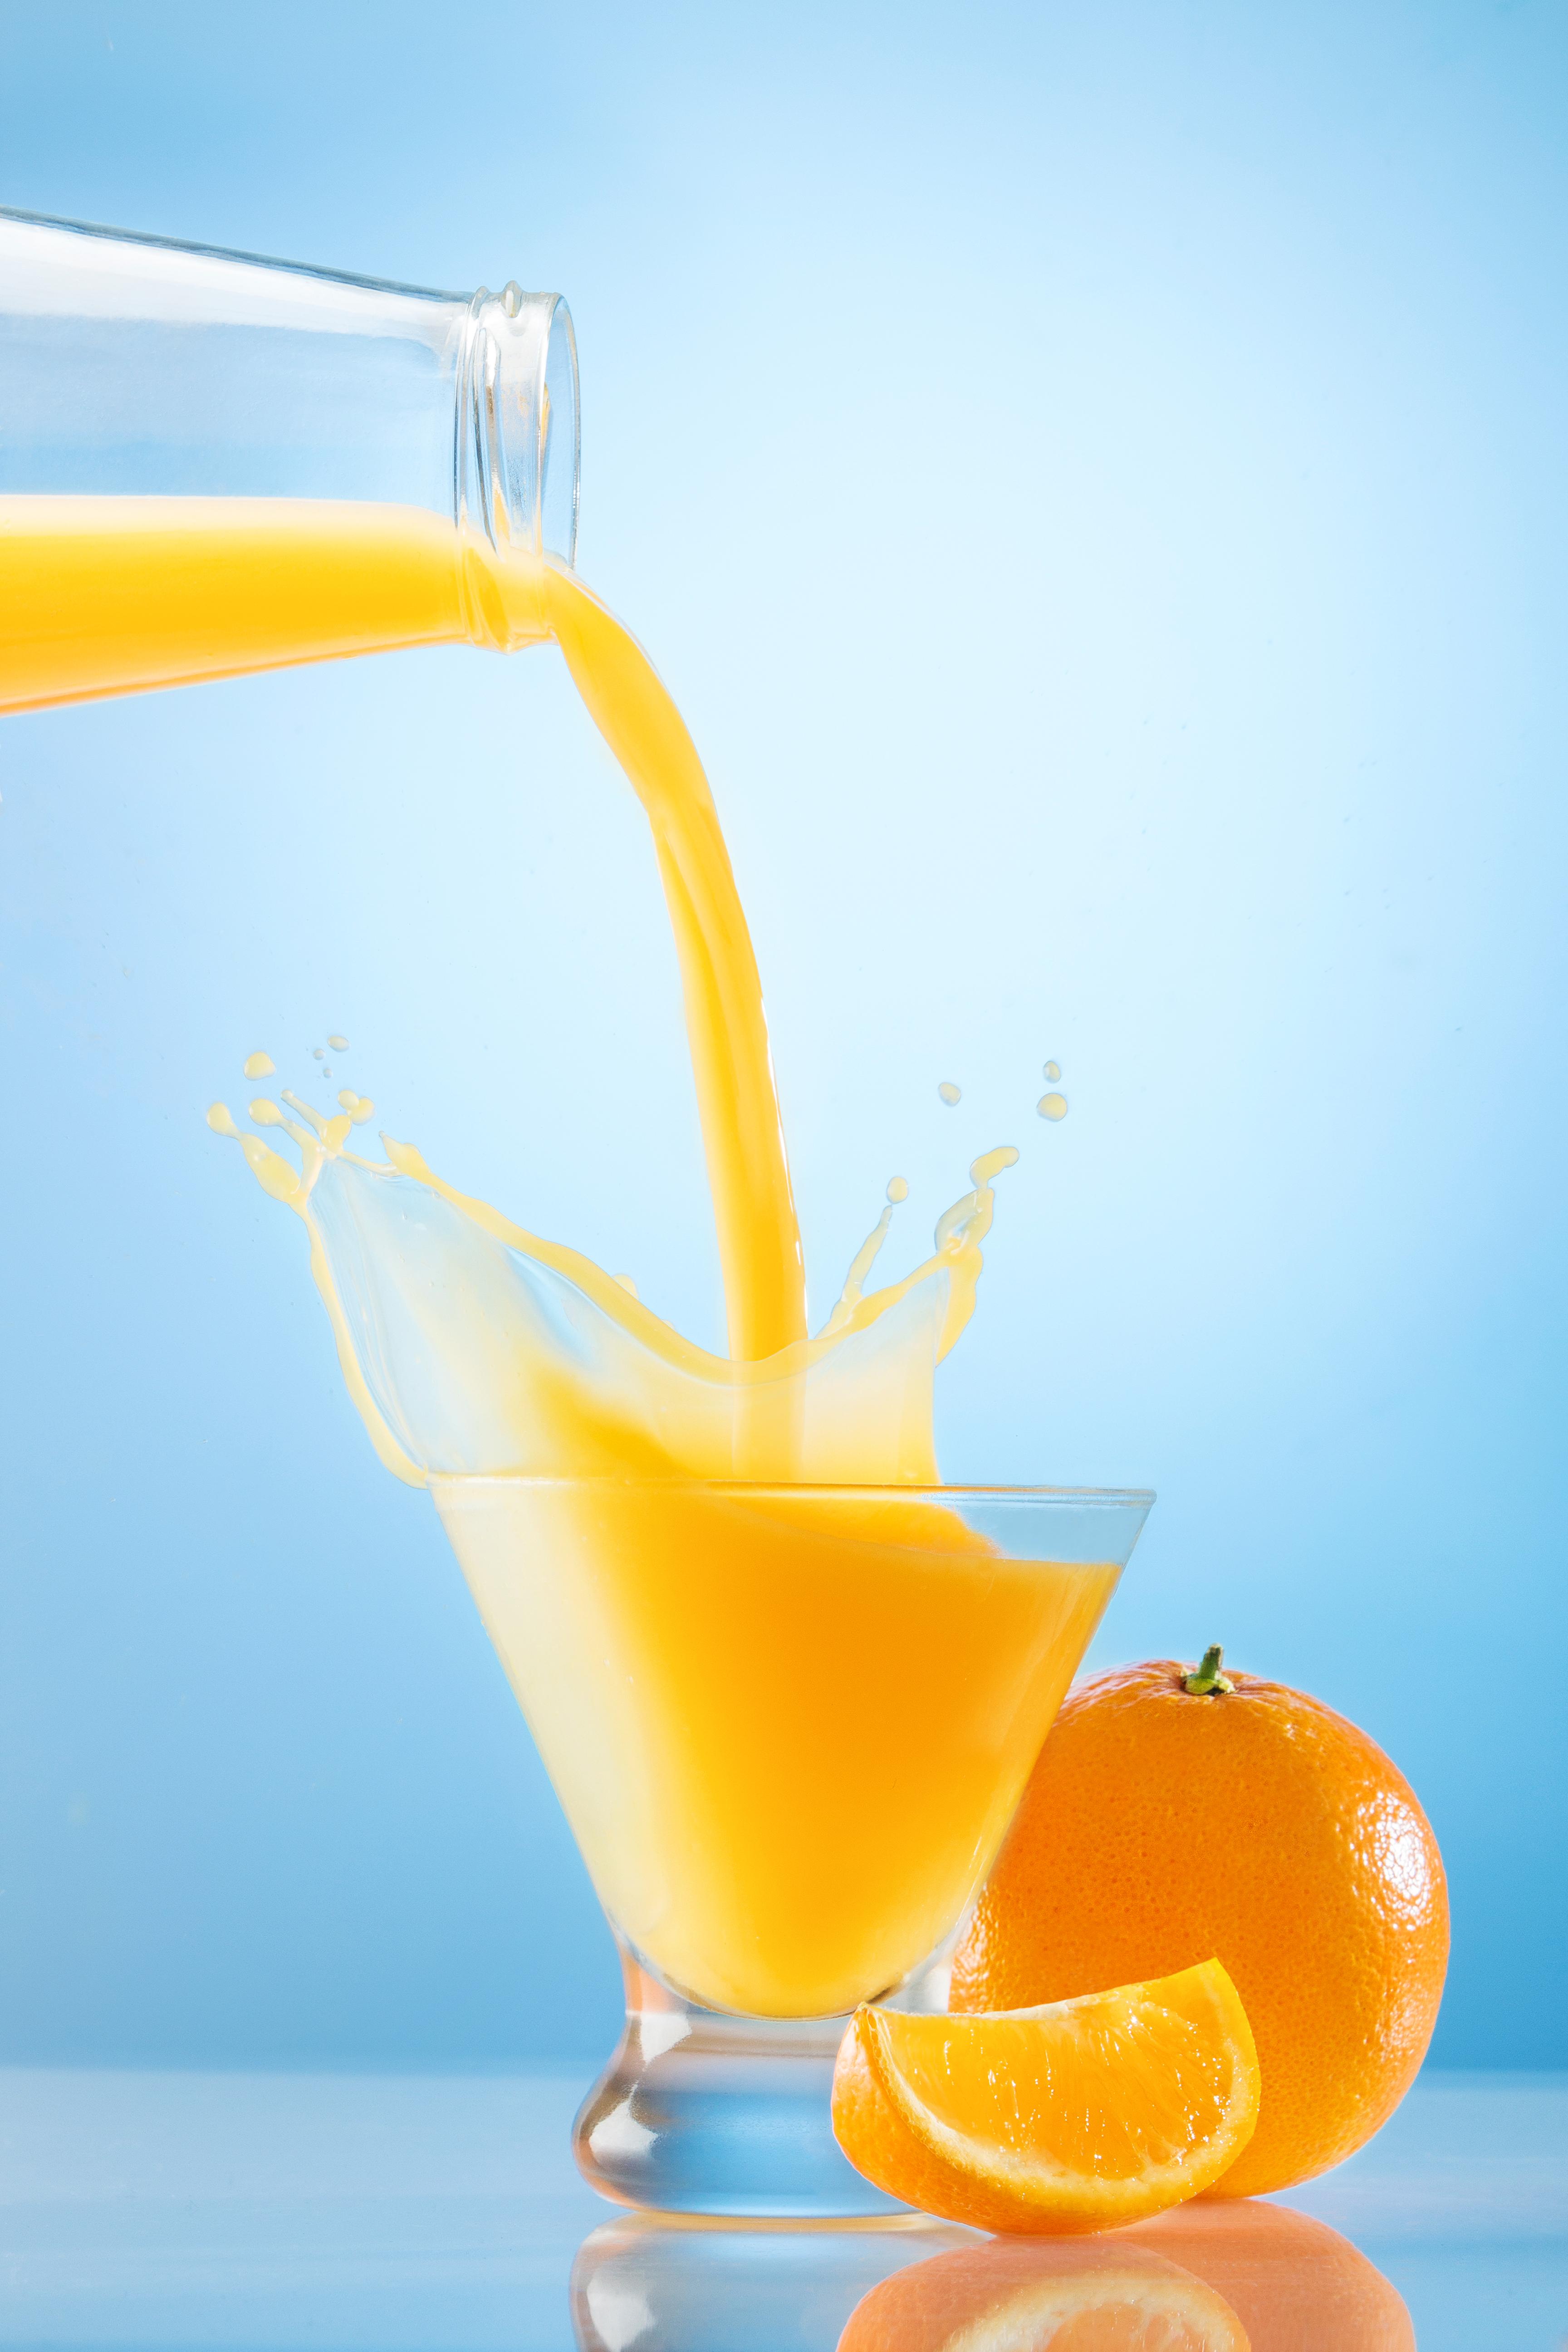 Orange Juice Fruit Beverage Splash